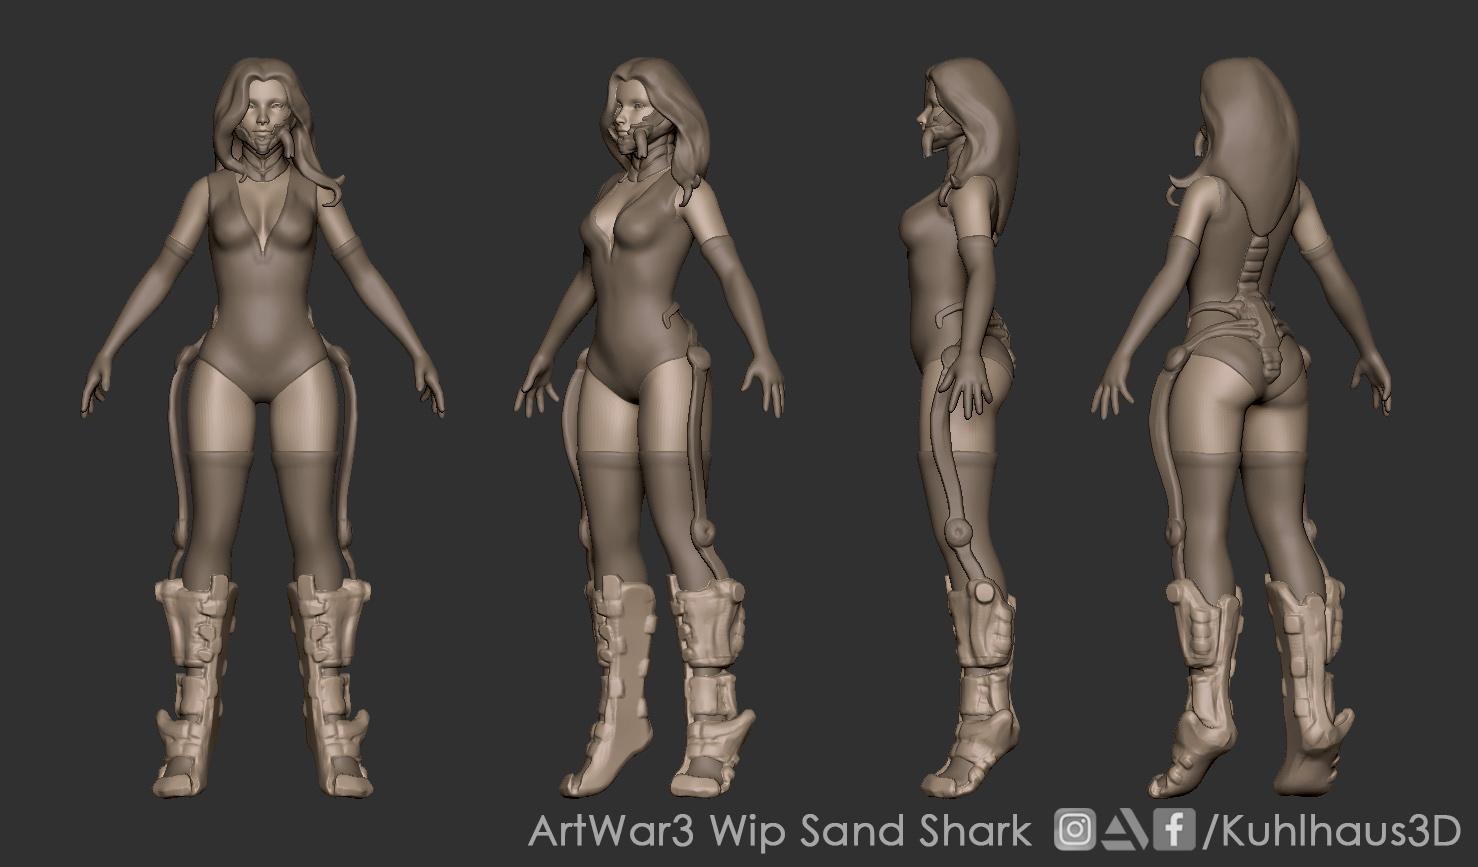 SandShark_181128_00.jpg